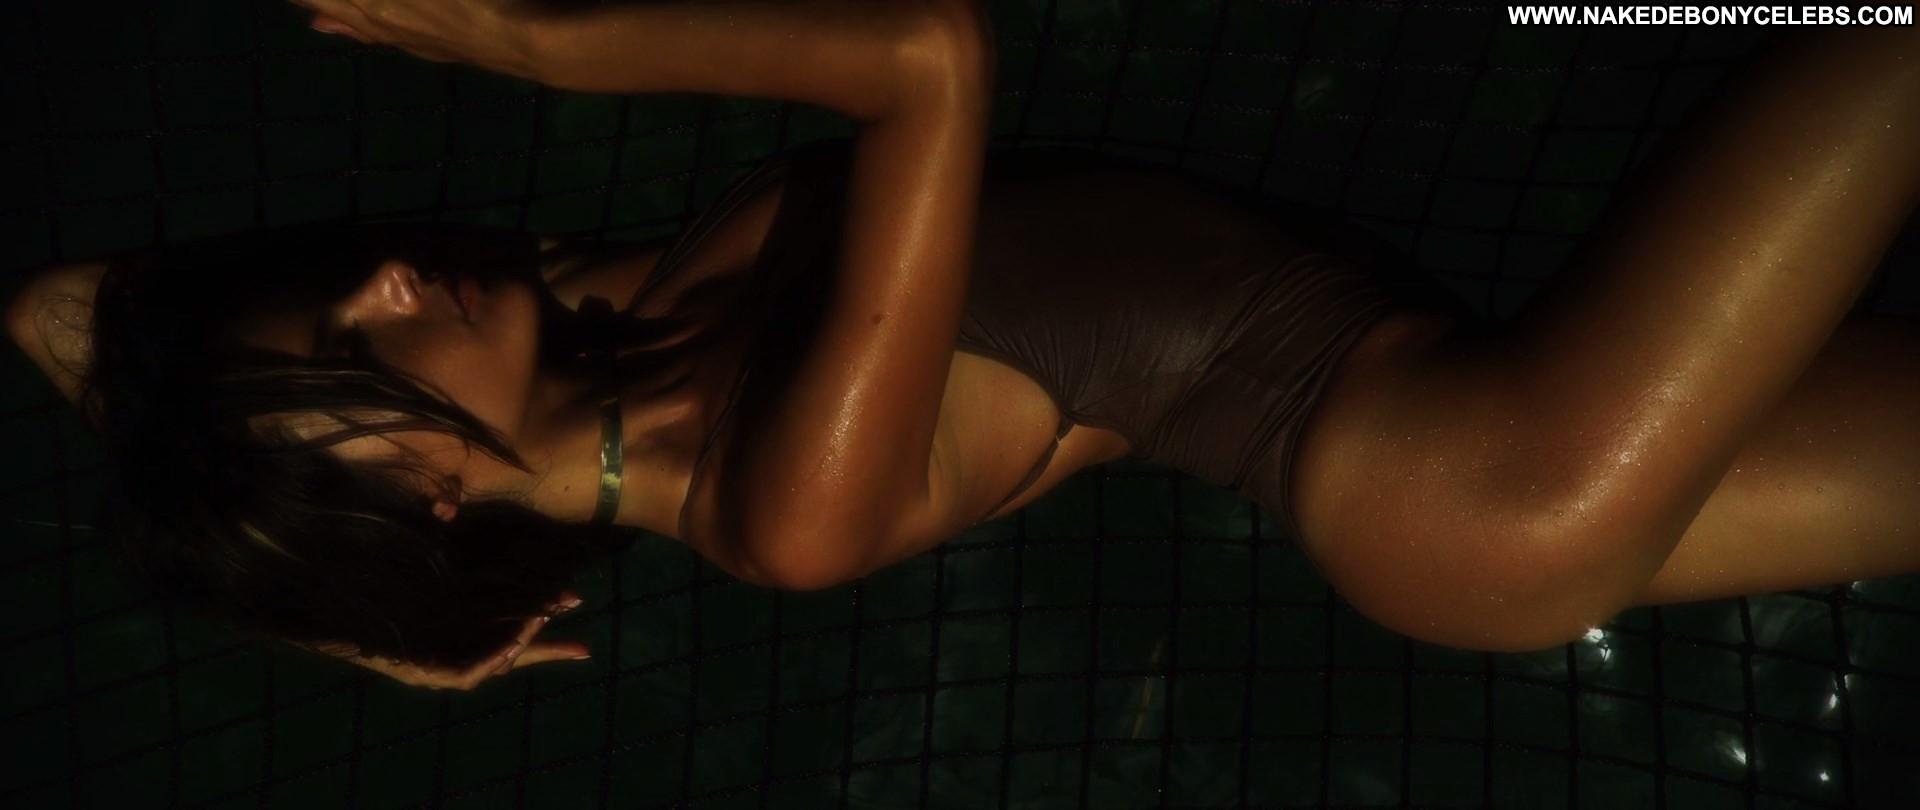 Hot Sexy Models Video